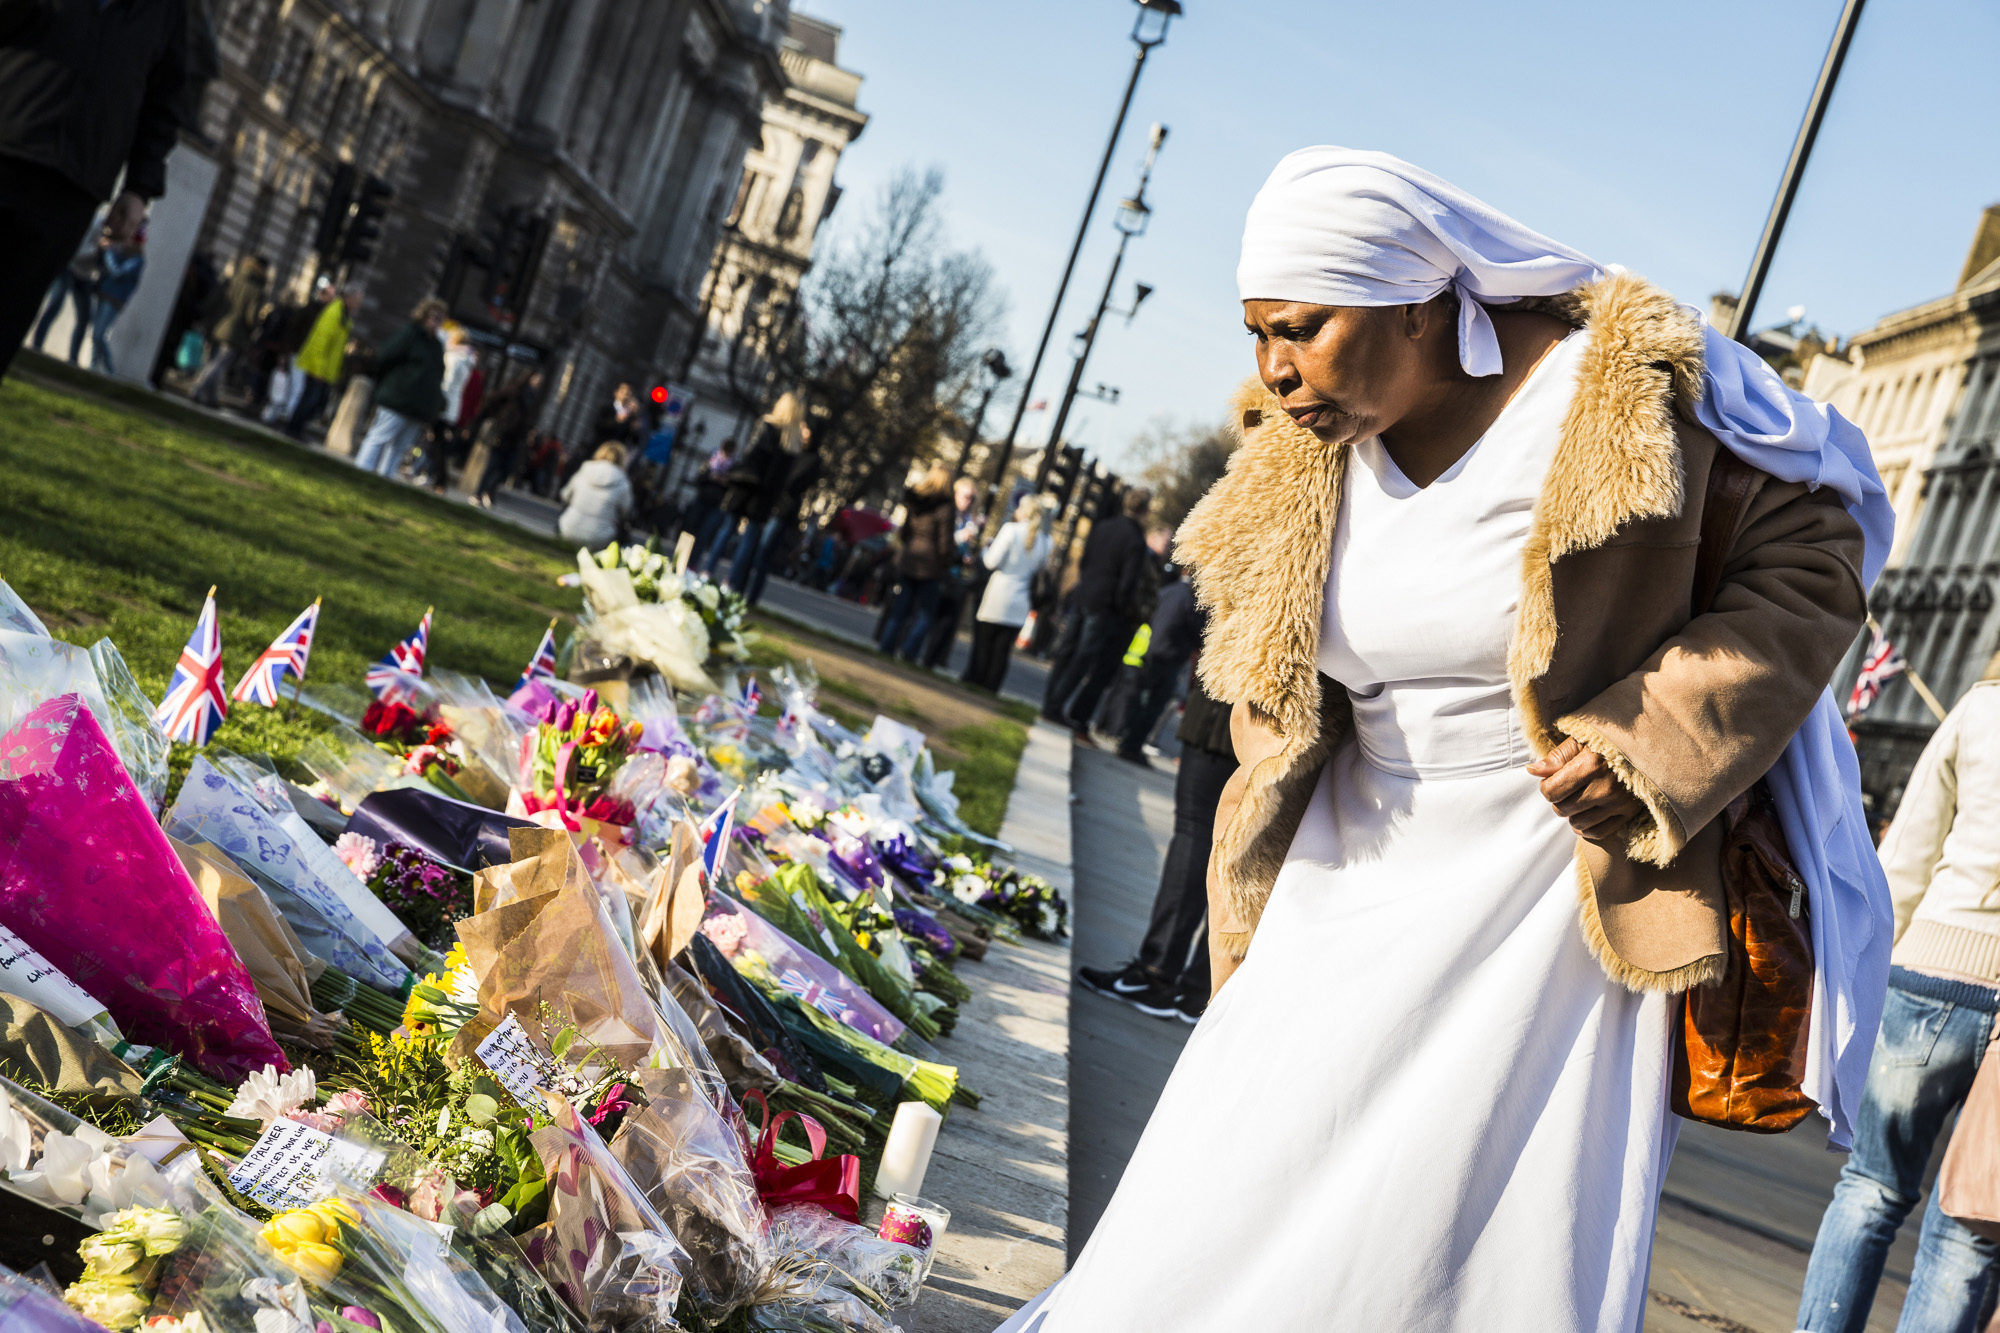 London_Attack_Hope_Not_Hate-40.jpg